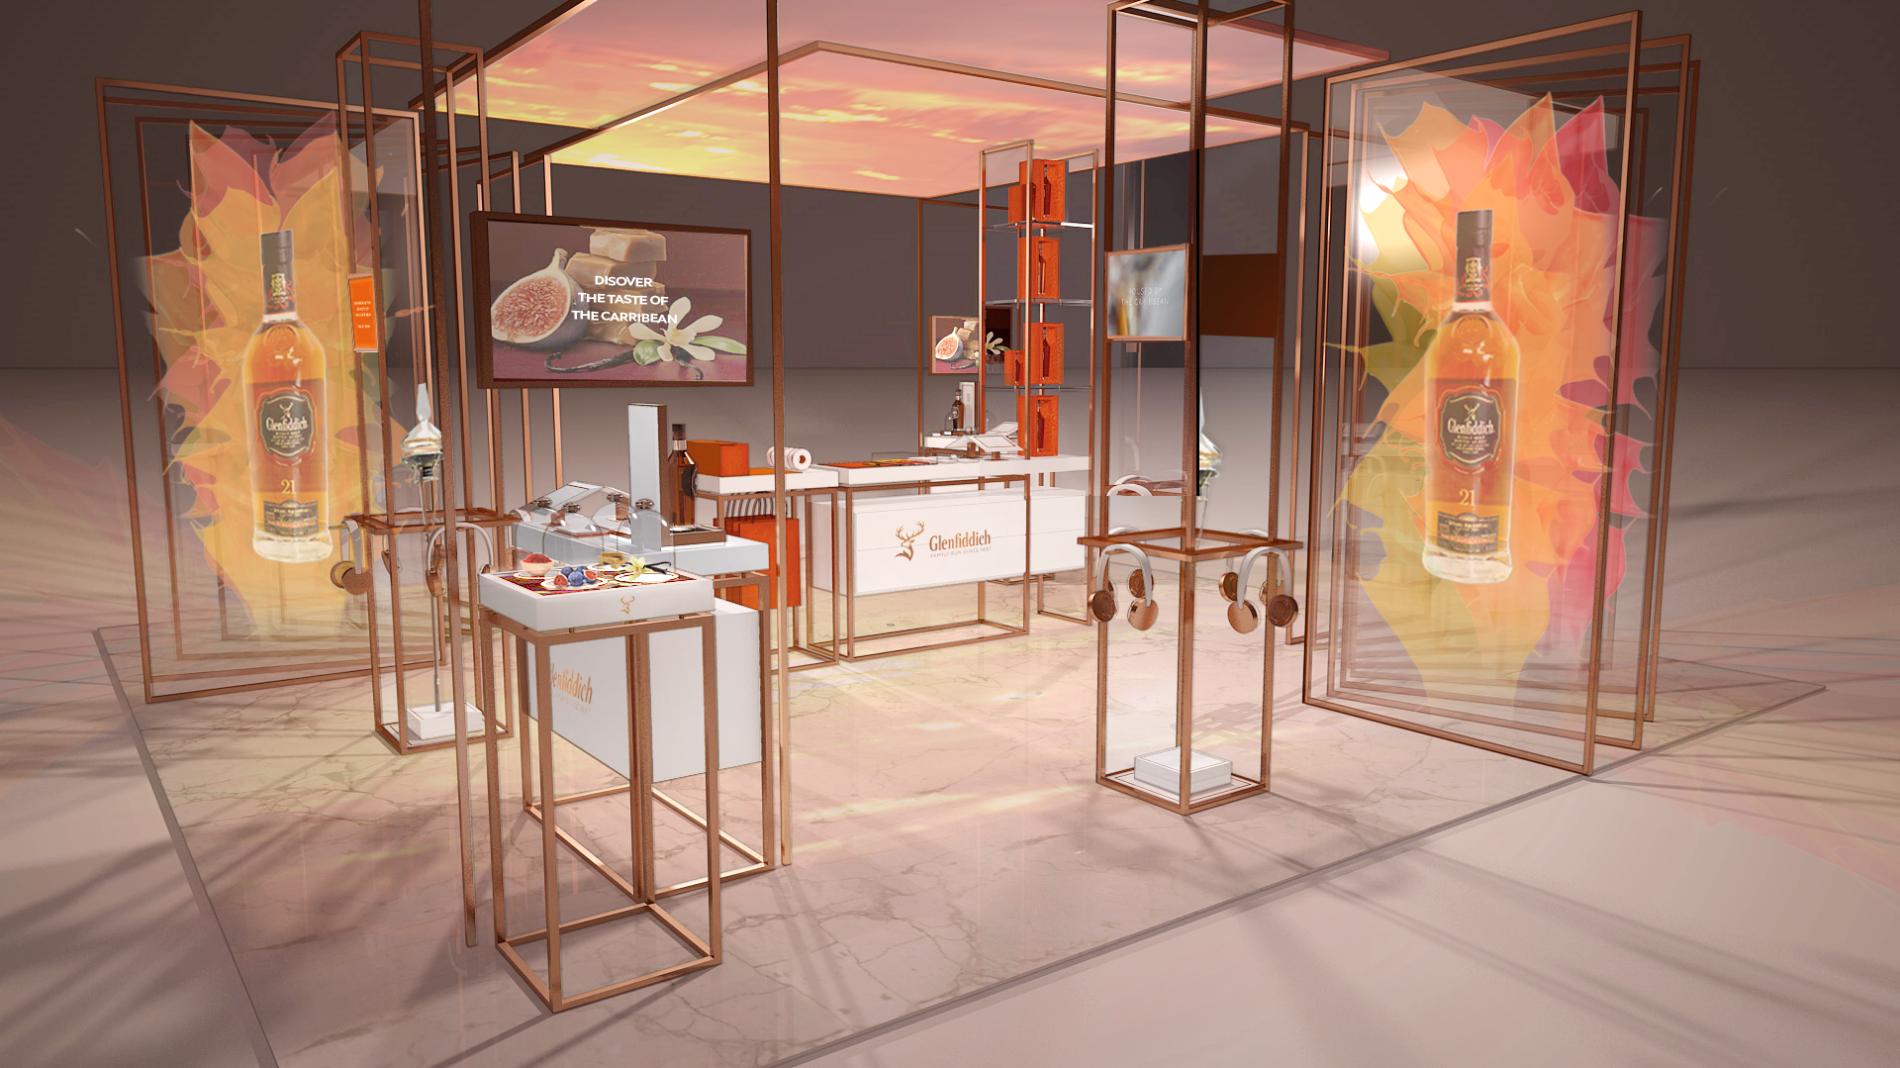 Glenfiddich pop up retail concept visual